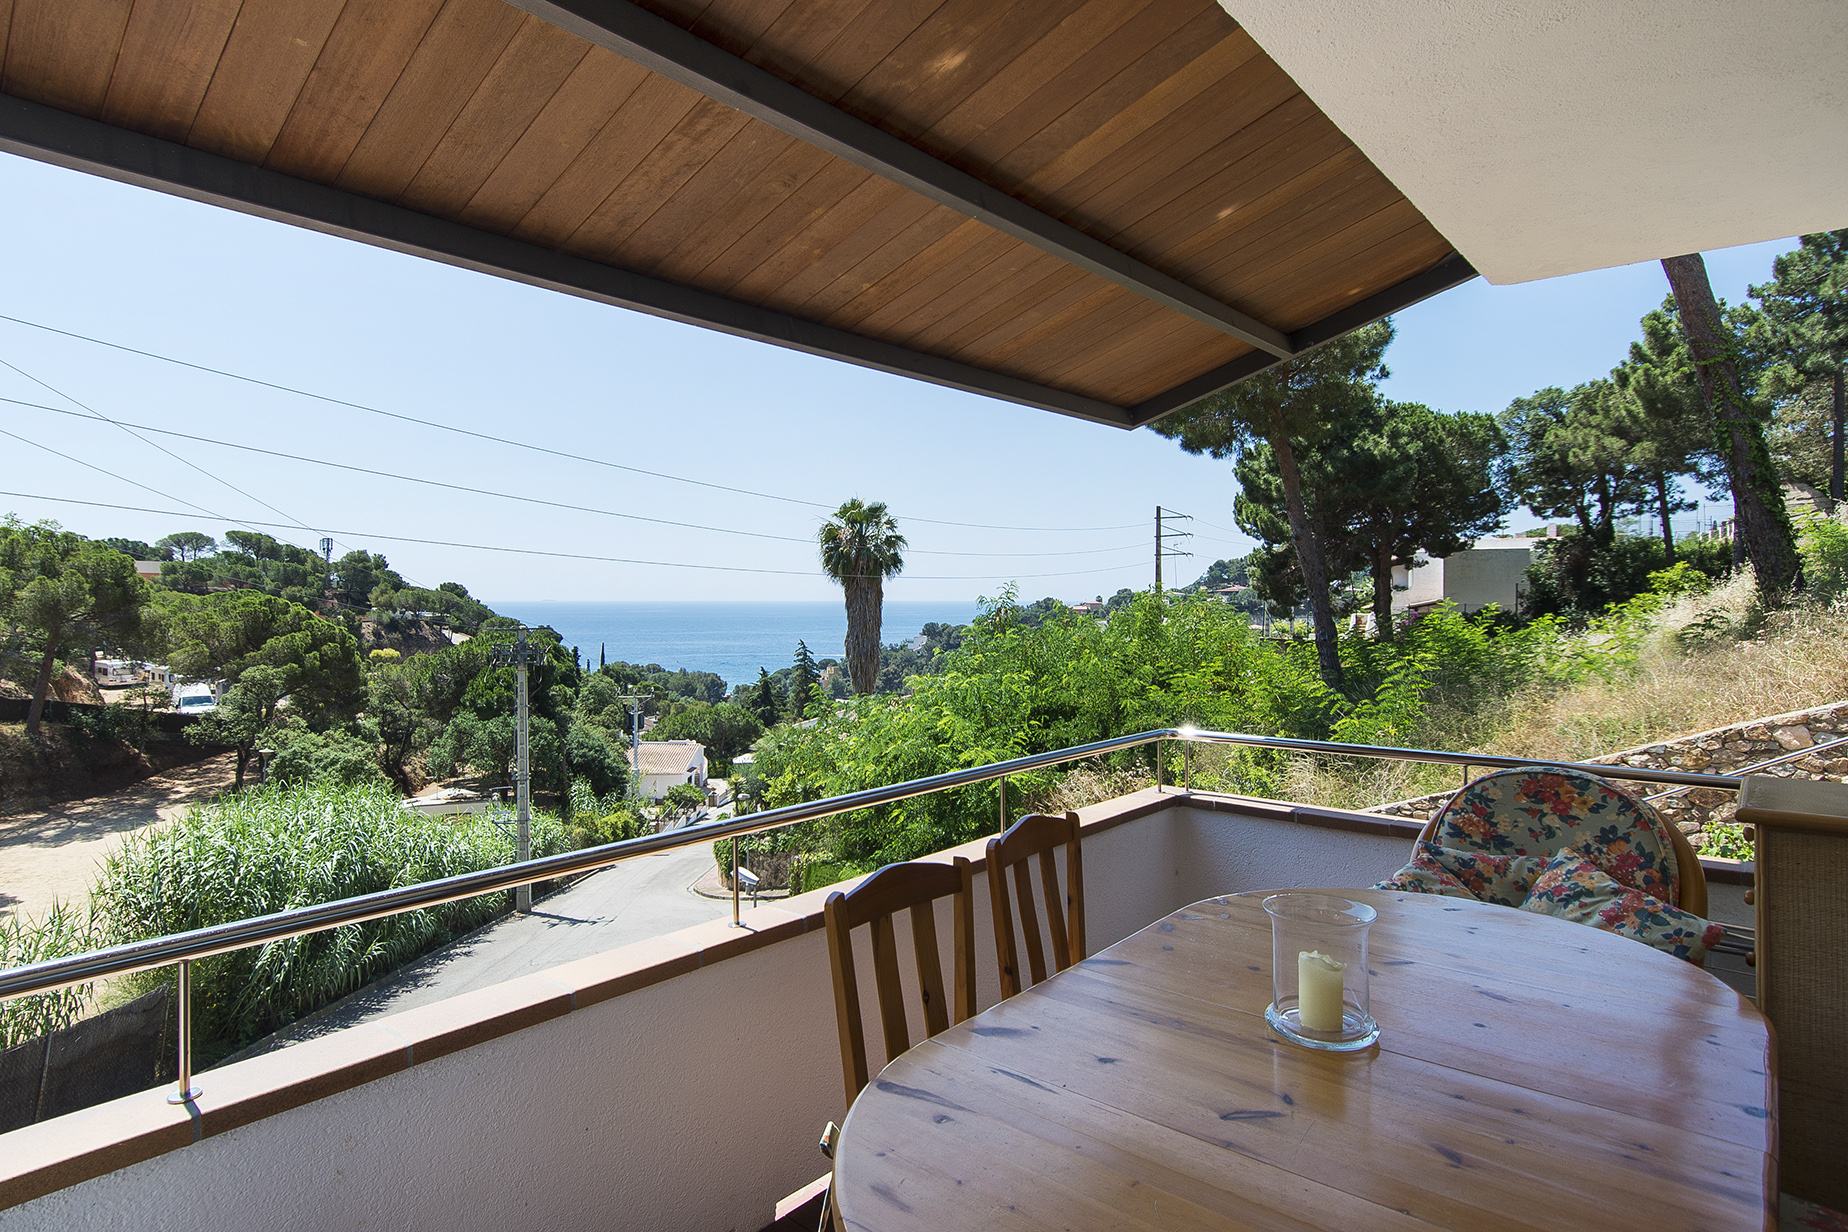 Single Family Home for Sale at Casa en Cala Canyelles con vistas al mar Lloret De Mar, Costa Brava 17310 Spain